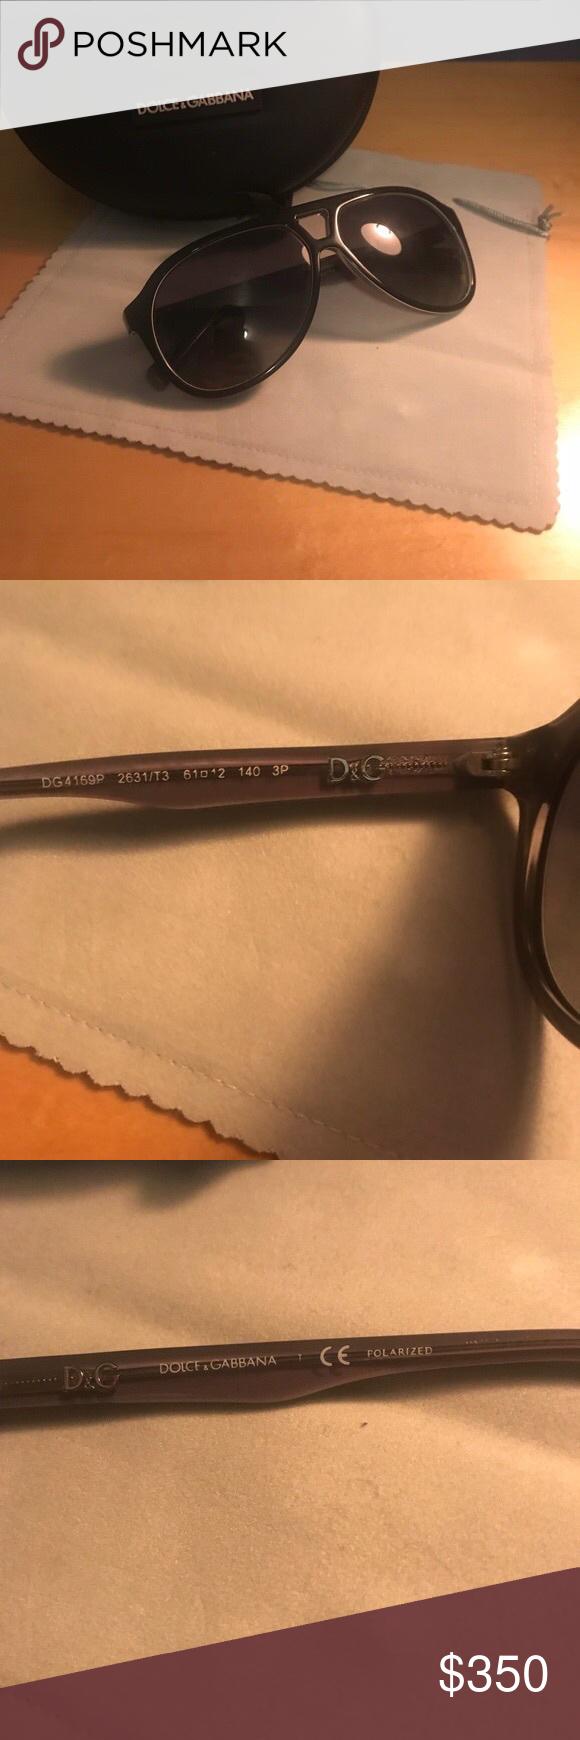 7c9b8c93e079 DOLCE   GABBANA .  dolcegabbana  sunglasses